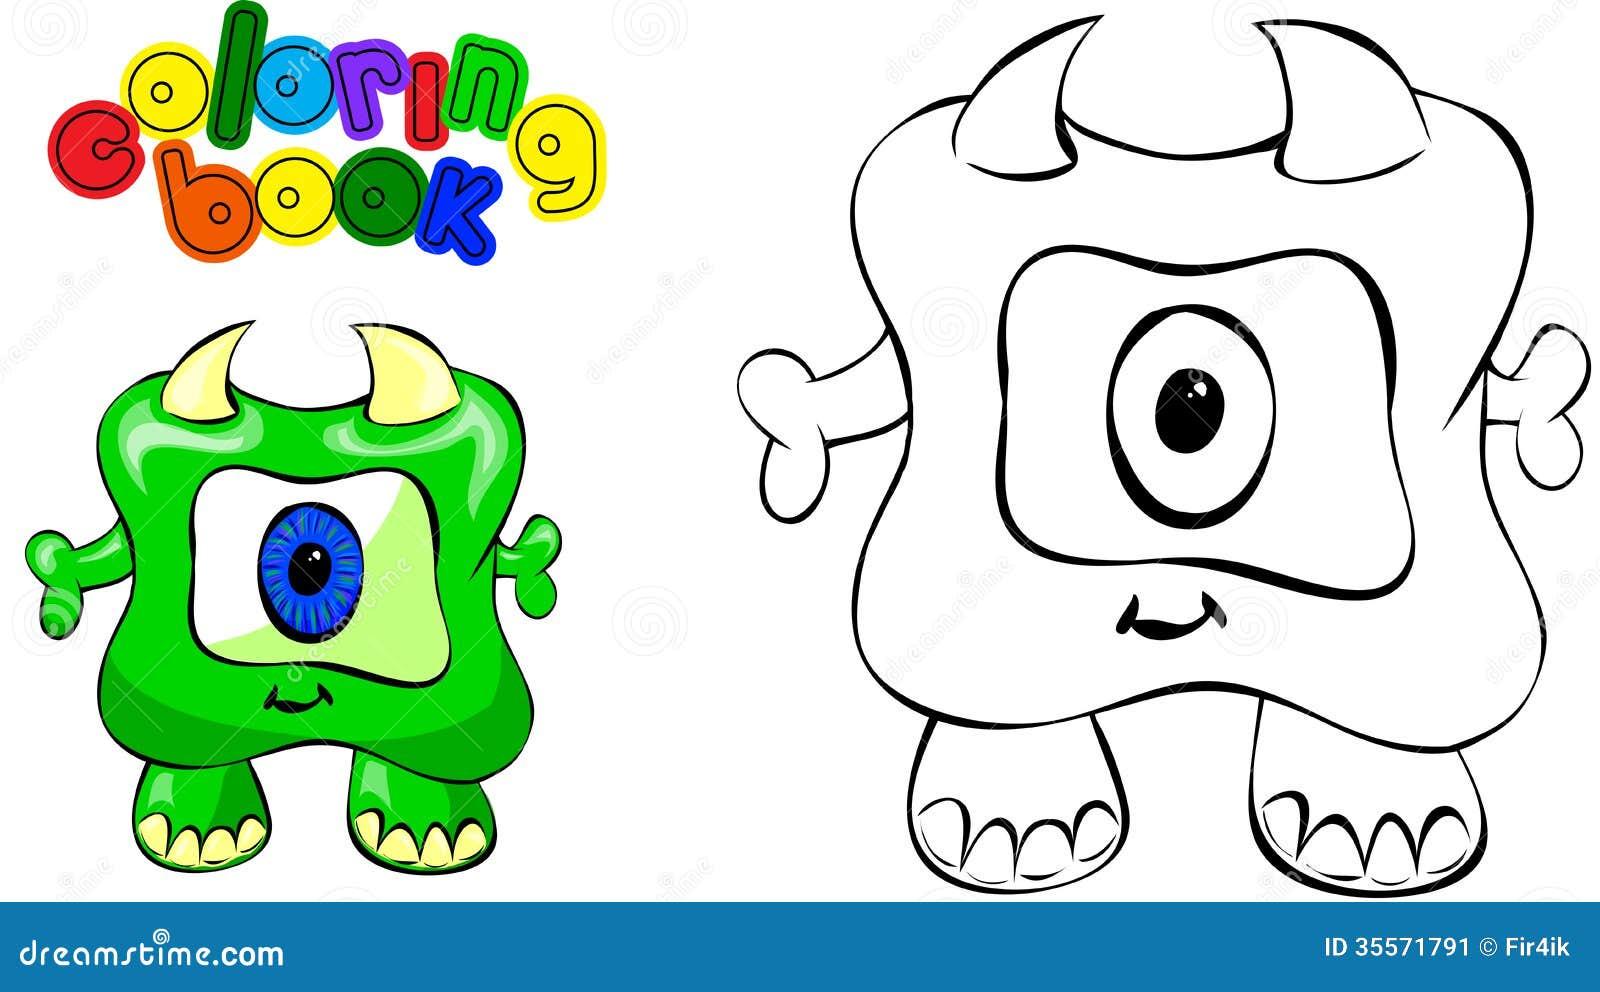 Excepcional Libro De Colorear De Monstruo Alto Patrón - Dibujos Para ...